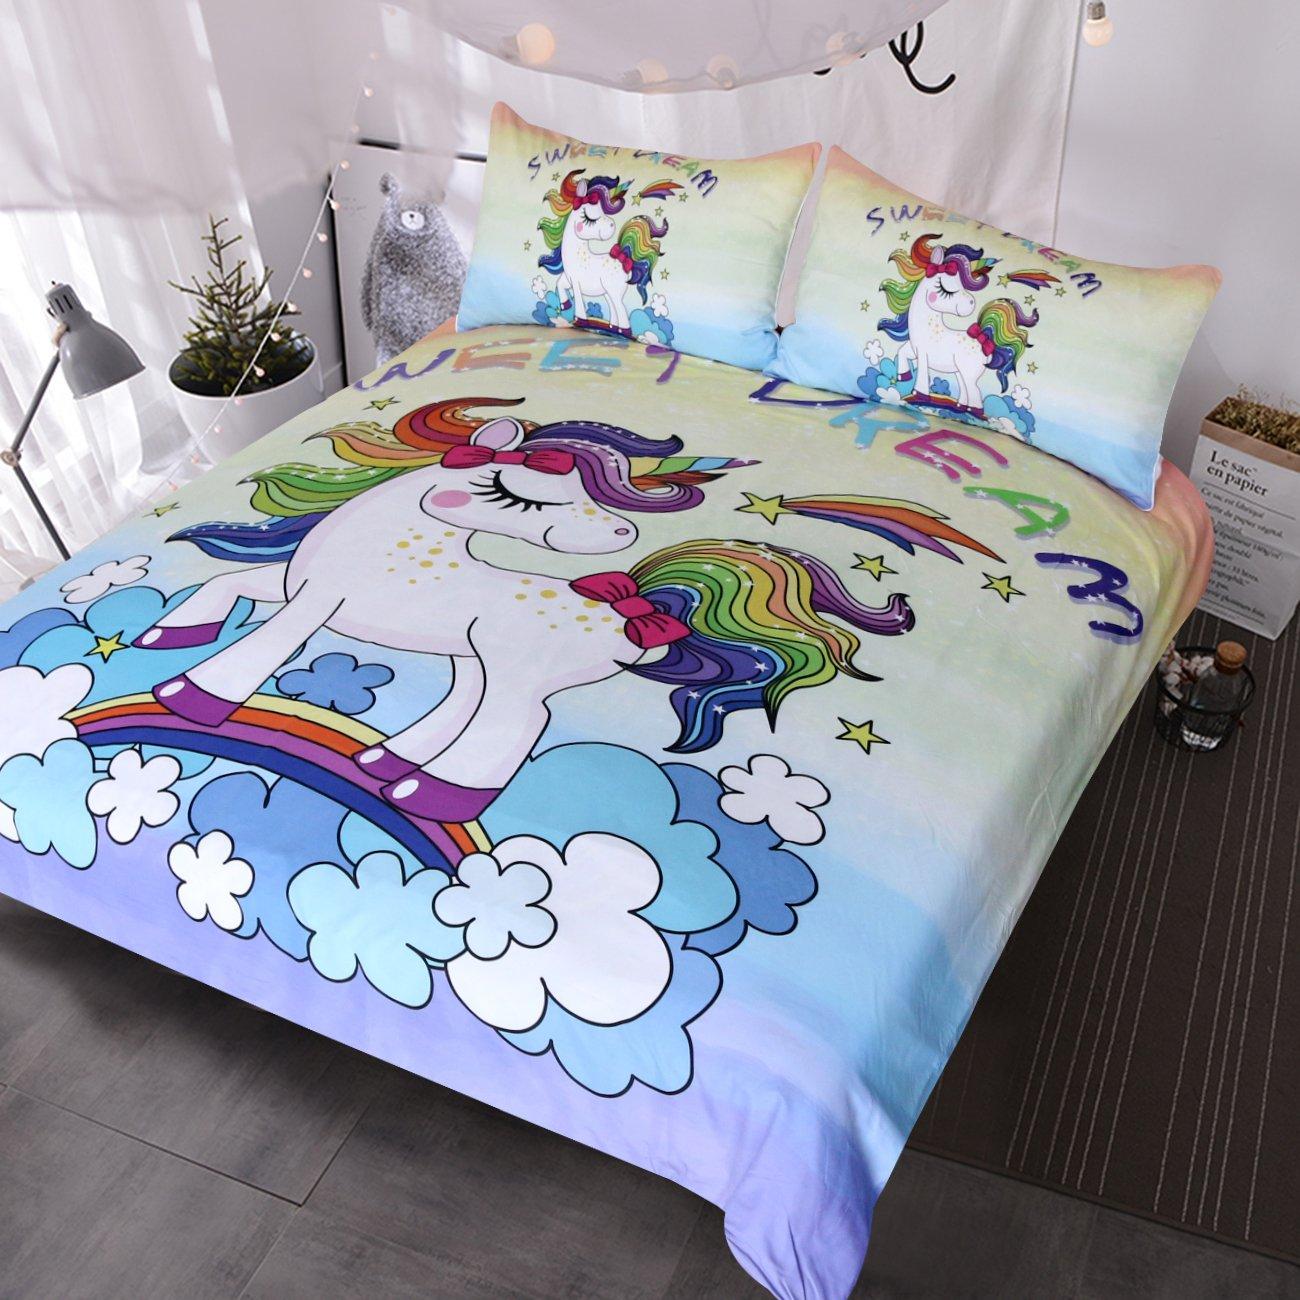 Twin BlessLiving Unicorn Kids Bedding Duvet Cover Set Cute Magical Unicorn with Rainbow 3 Piece Super Soft Teen Girl Purple Yellow Bedspreads